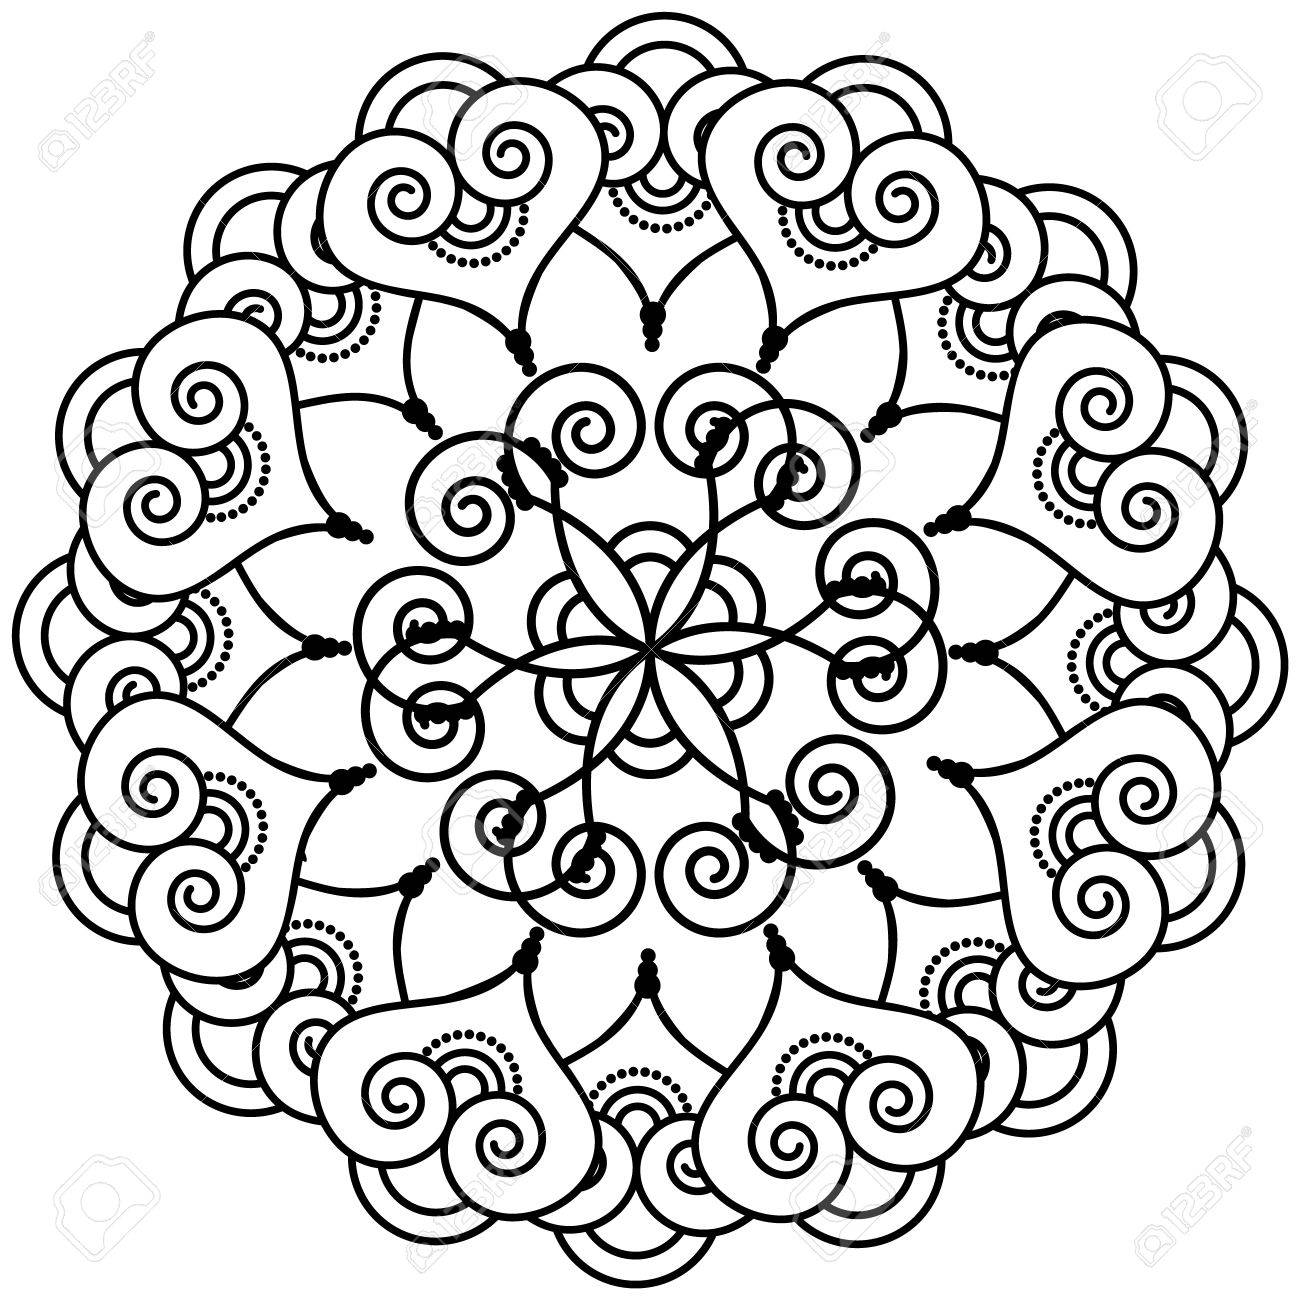 indian henna tattoo inspired flower shape with inner floral star rh 123rf com Henna Flower Vector Henna Tattoo